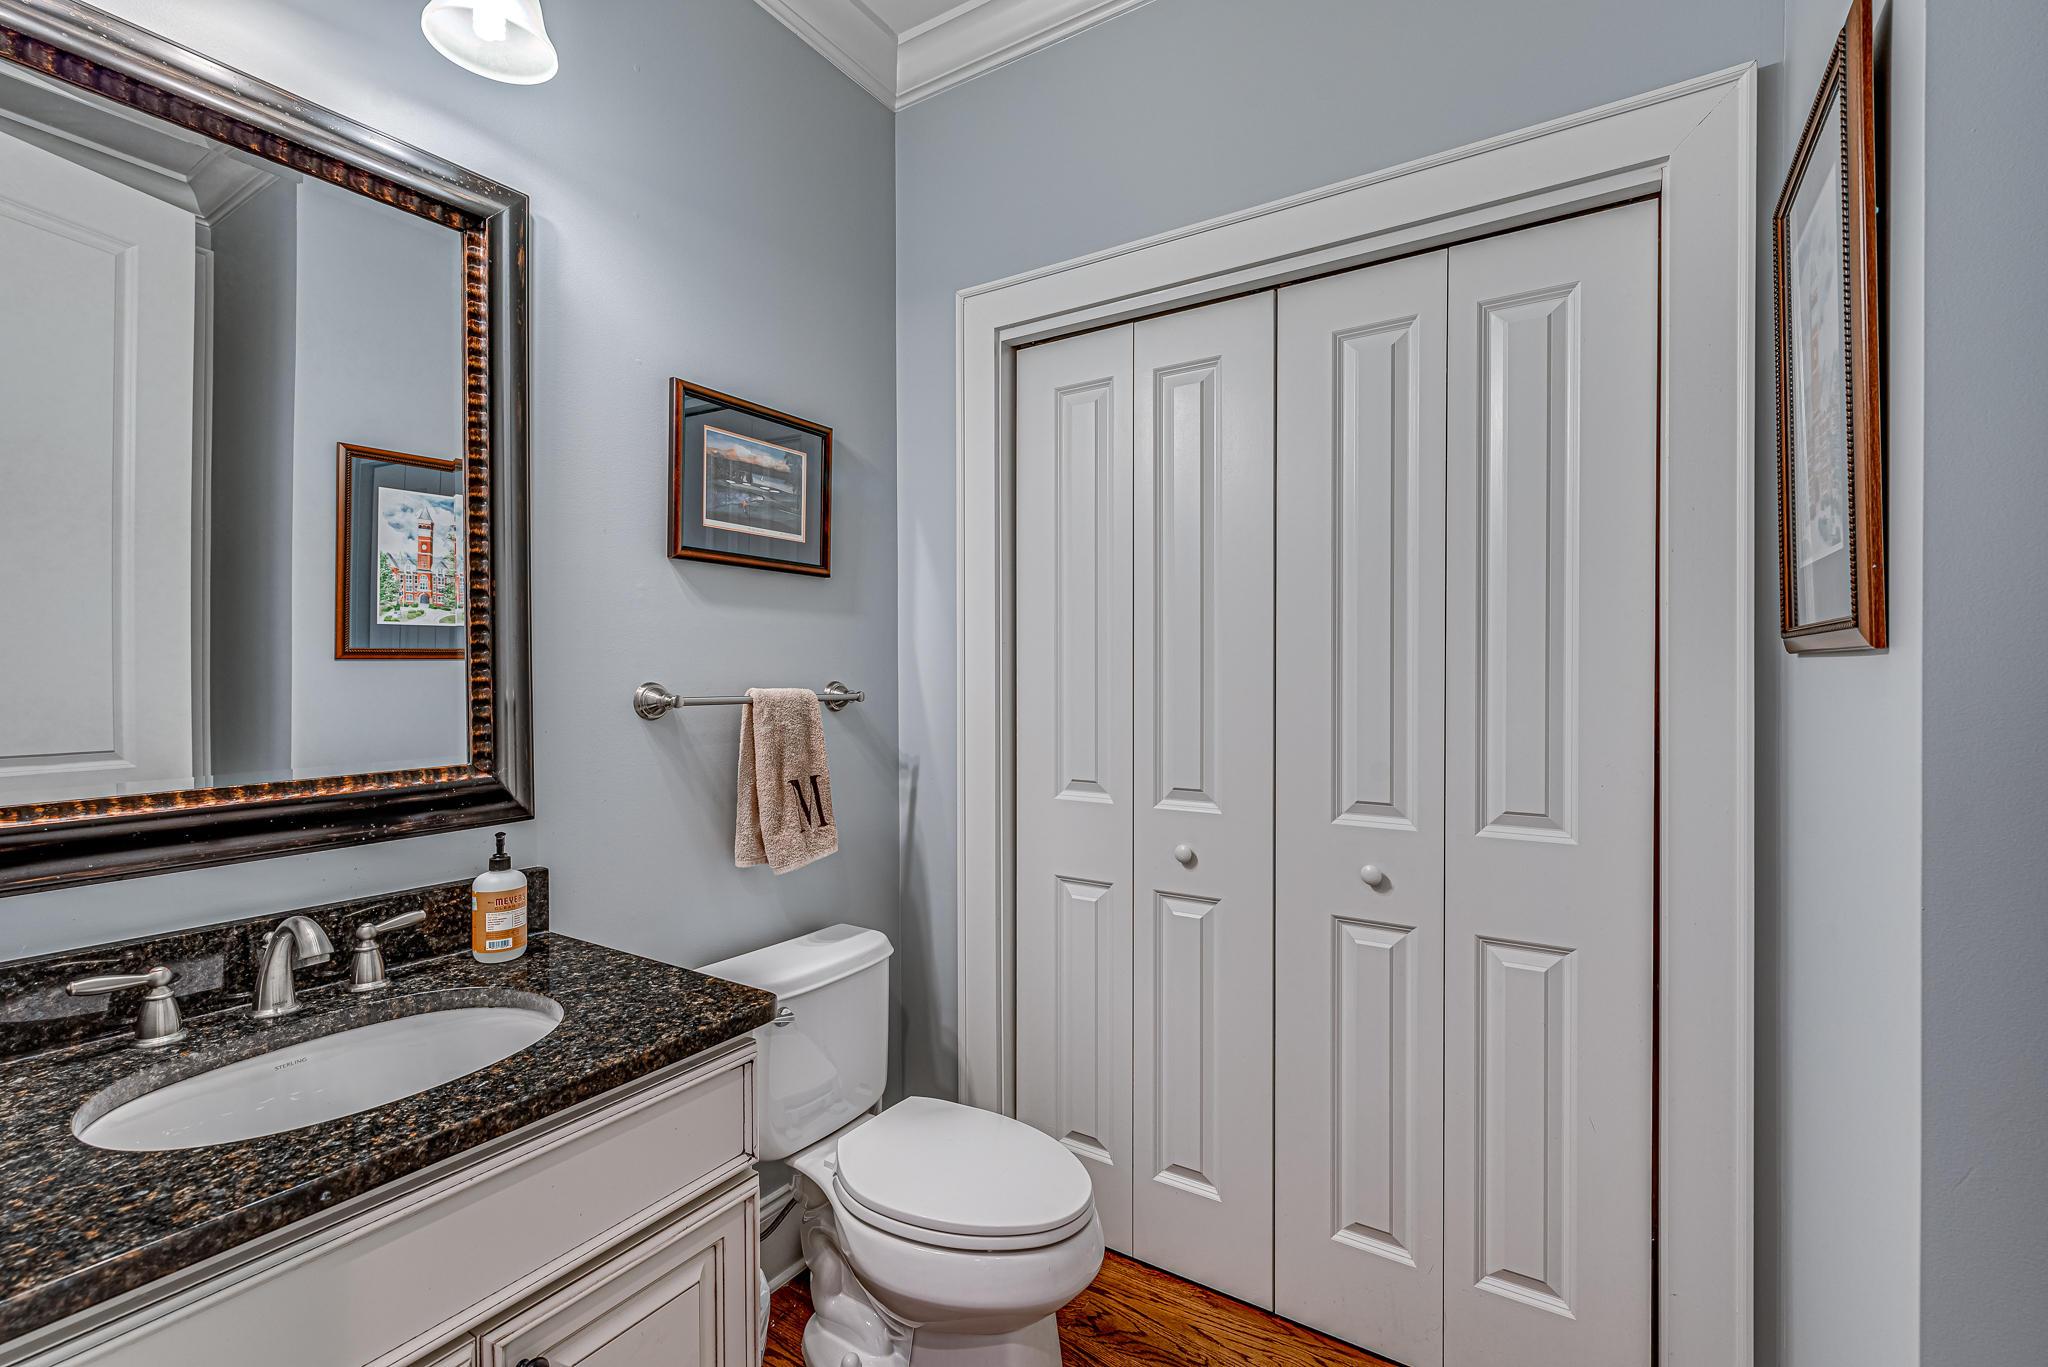 Daniel Island Smythe Park Homes For Sale - 1410 Wando View, Charleston, SC - 29